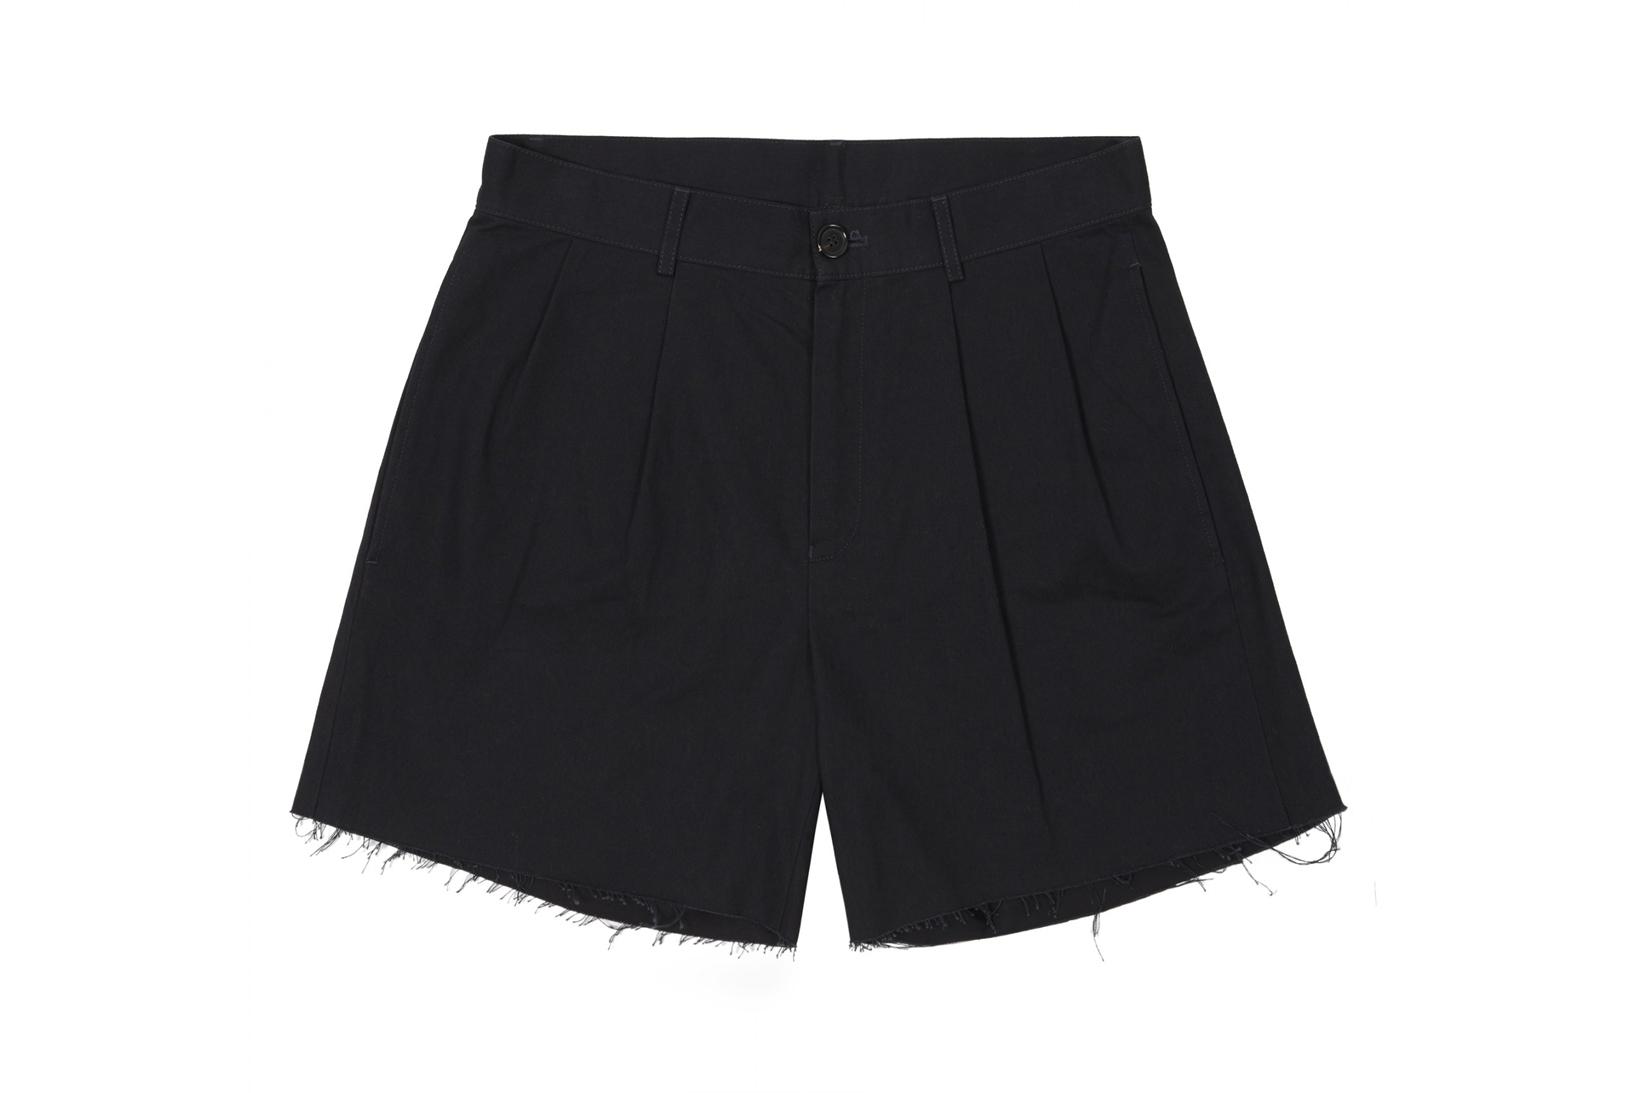 Gosha Rubchinskiy Kappa Collections Apparel Sportswear Tracksuits - 3764470